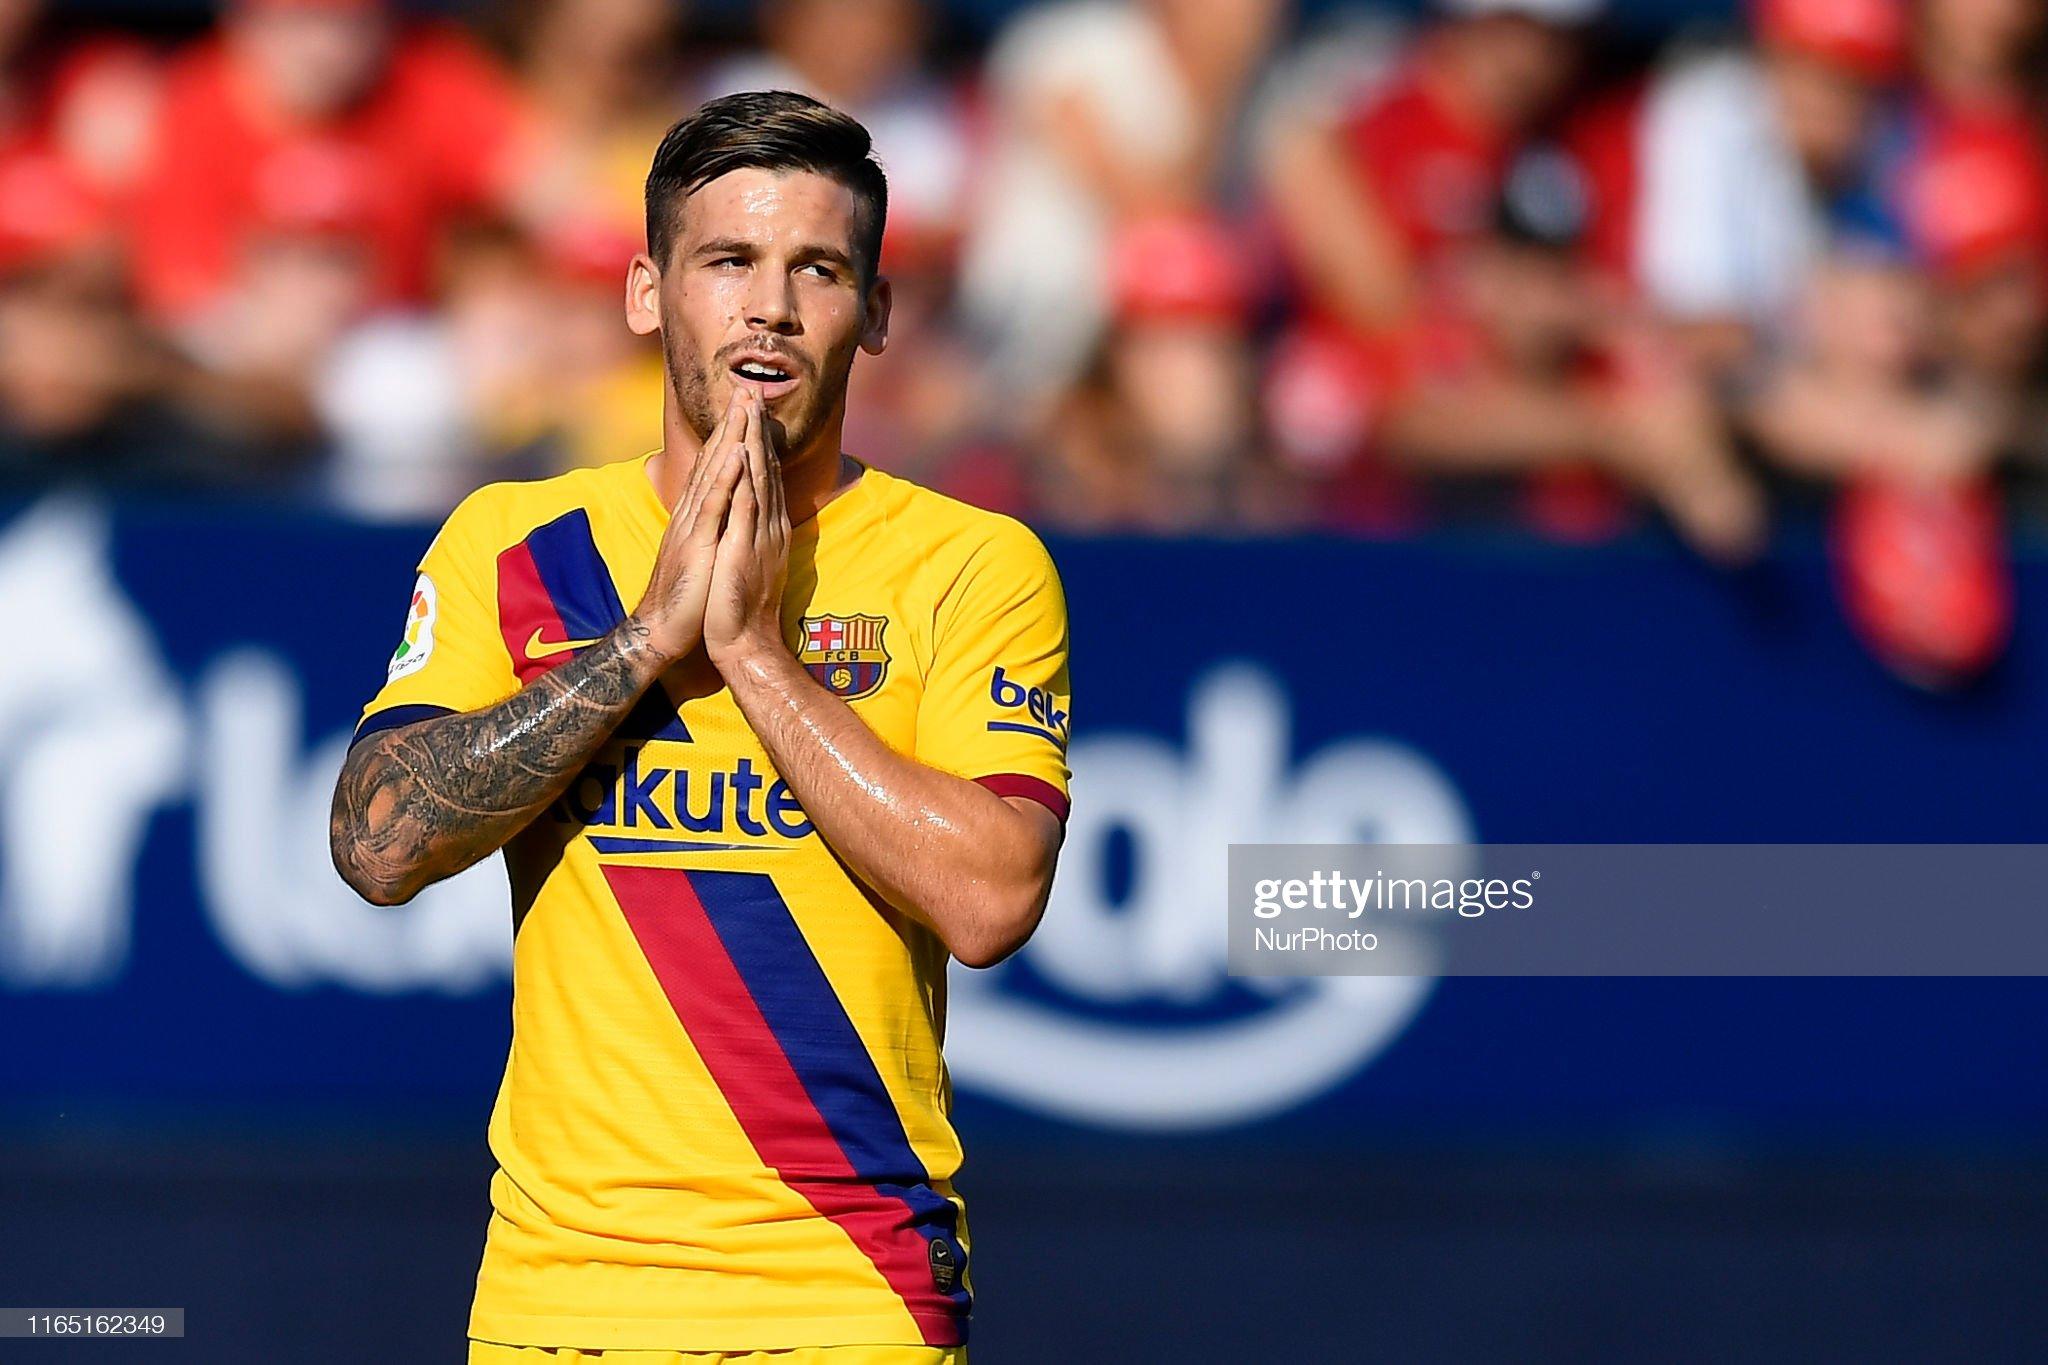 صور مباراة : أوساسونا - برشلونة 2-2 ( 31-08-2019 )  Carles-perez-of-barcelona-lament-a-failed-occasion-during-the-liga-picture-id1165162349?s=2048x2048